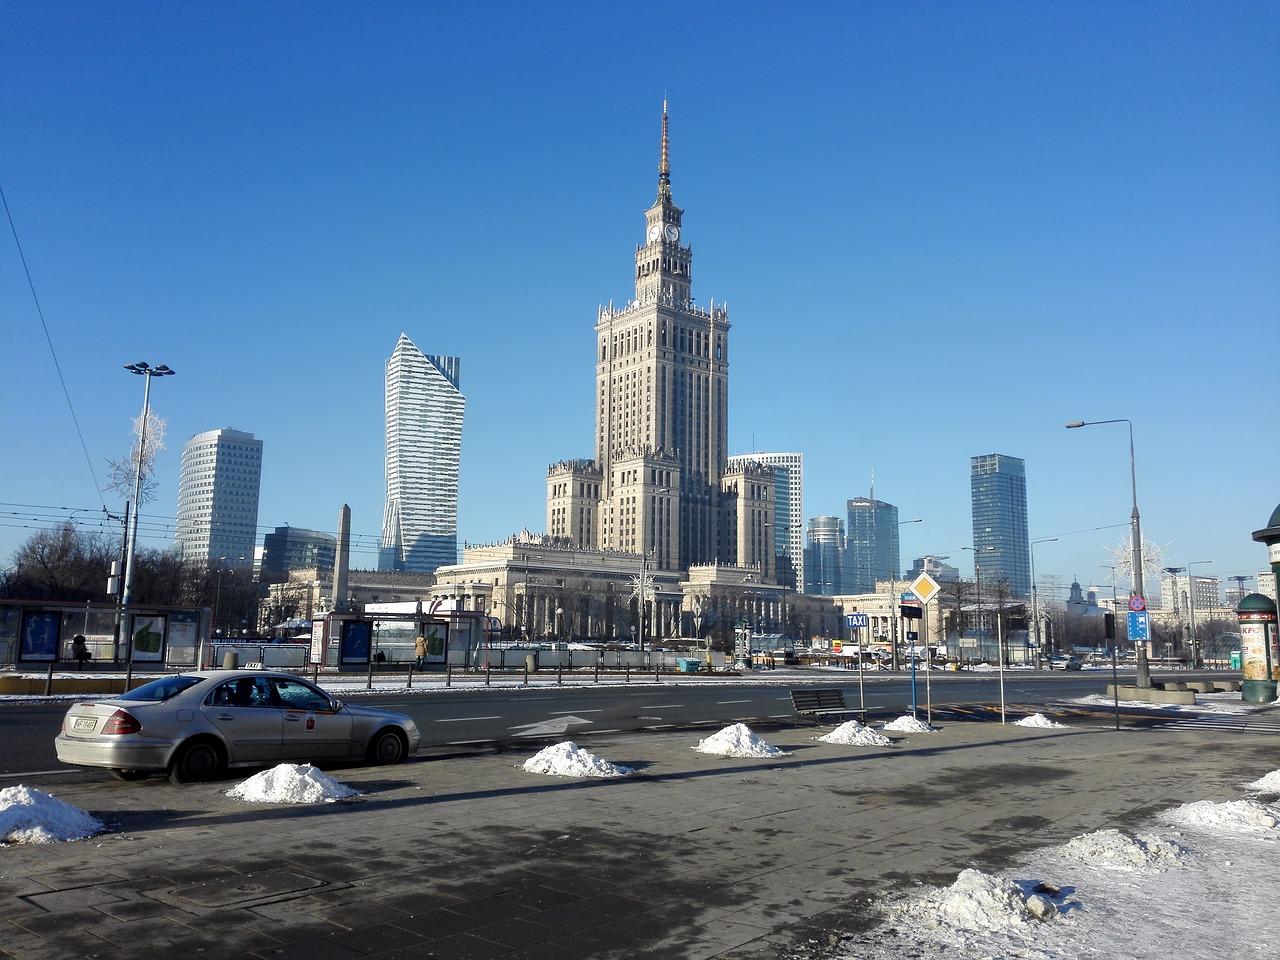 Poland Supreme Court warns judicial reforms threaten EU membership